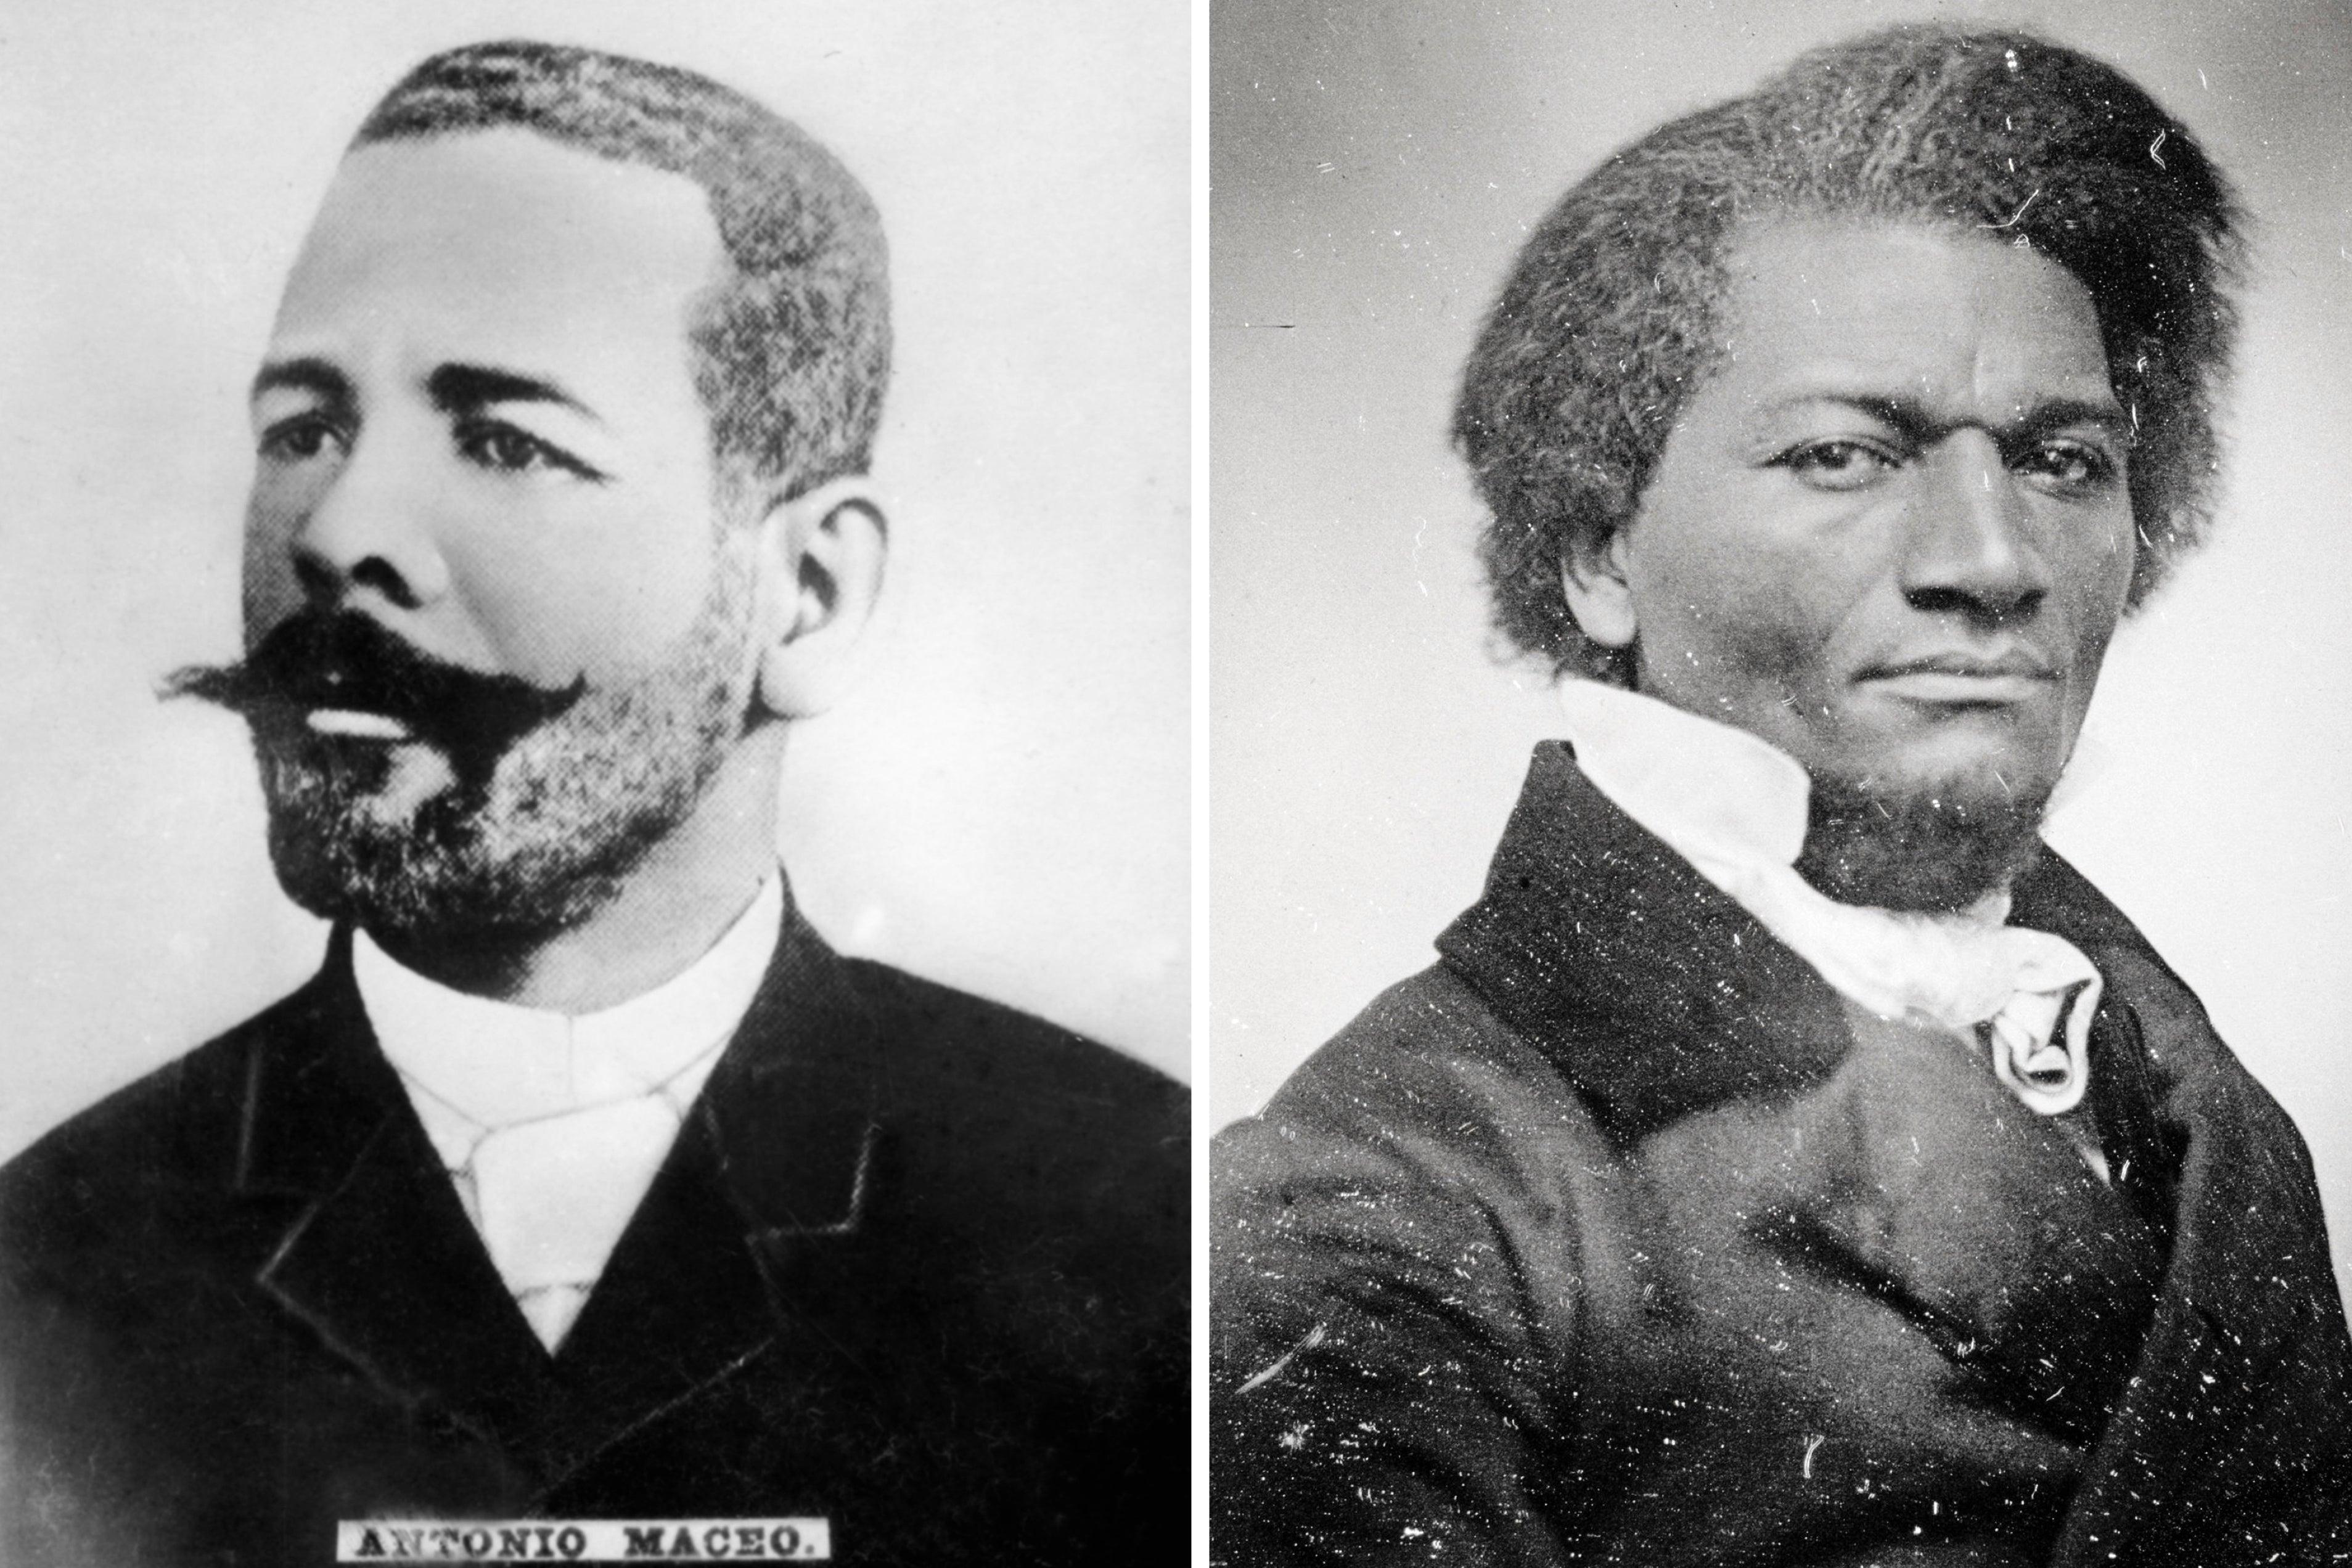 The Whitewashing of Black Genius